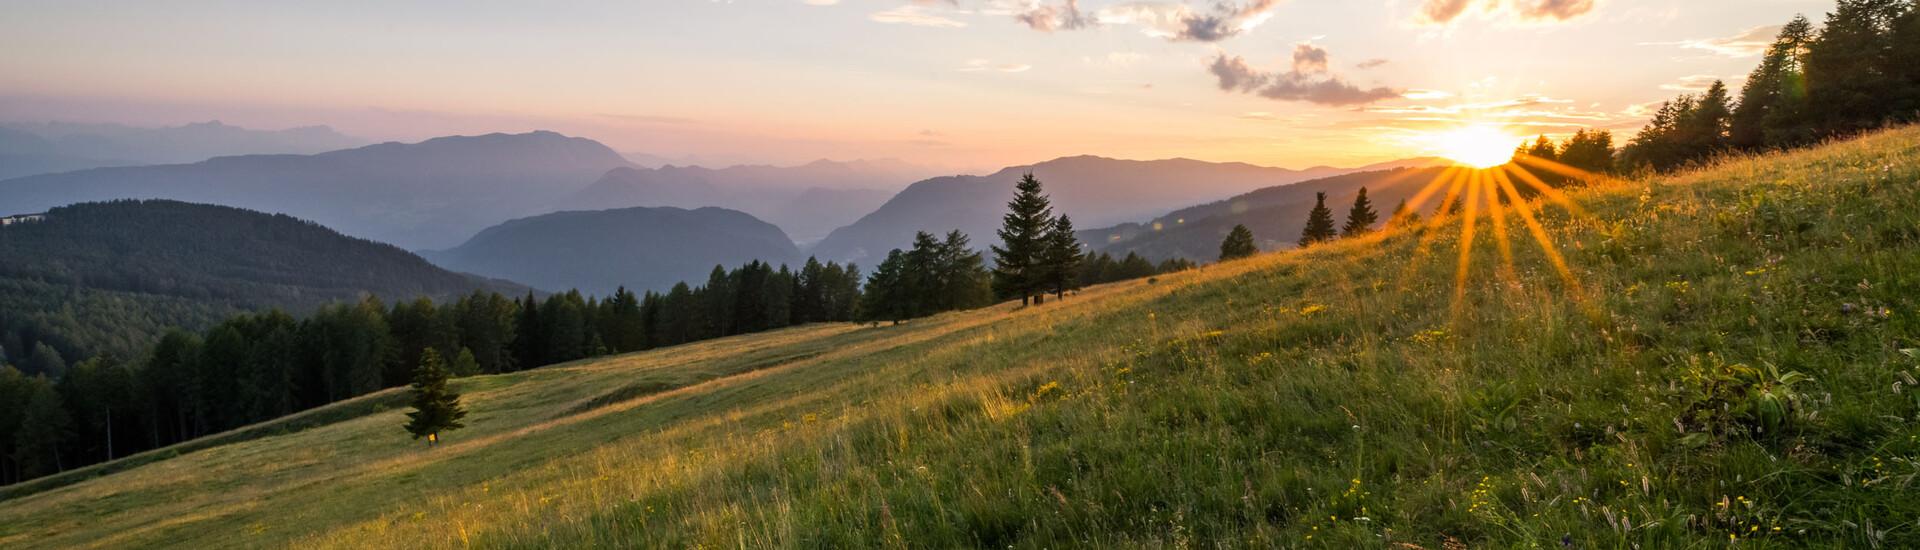 Der Sonnenuntergang über den Bergen in Villach Umgebung